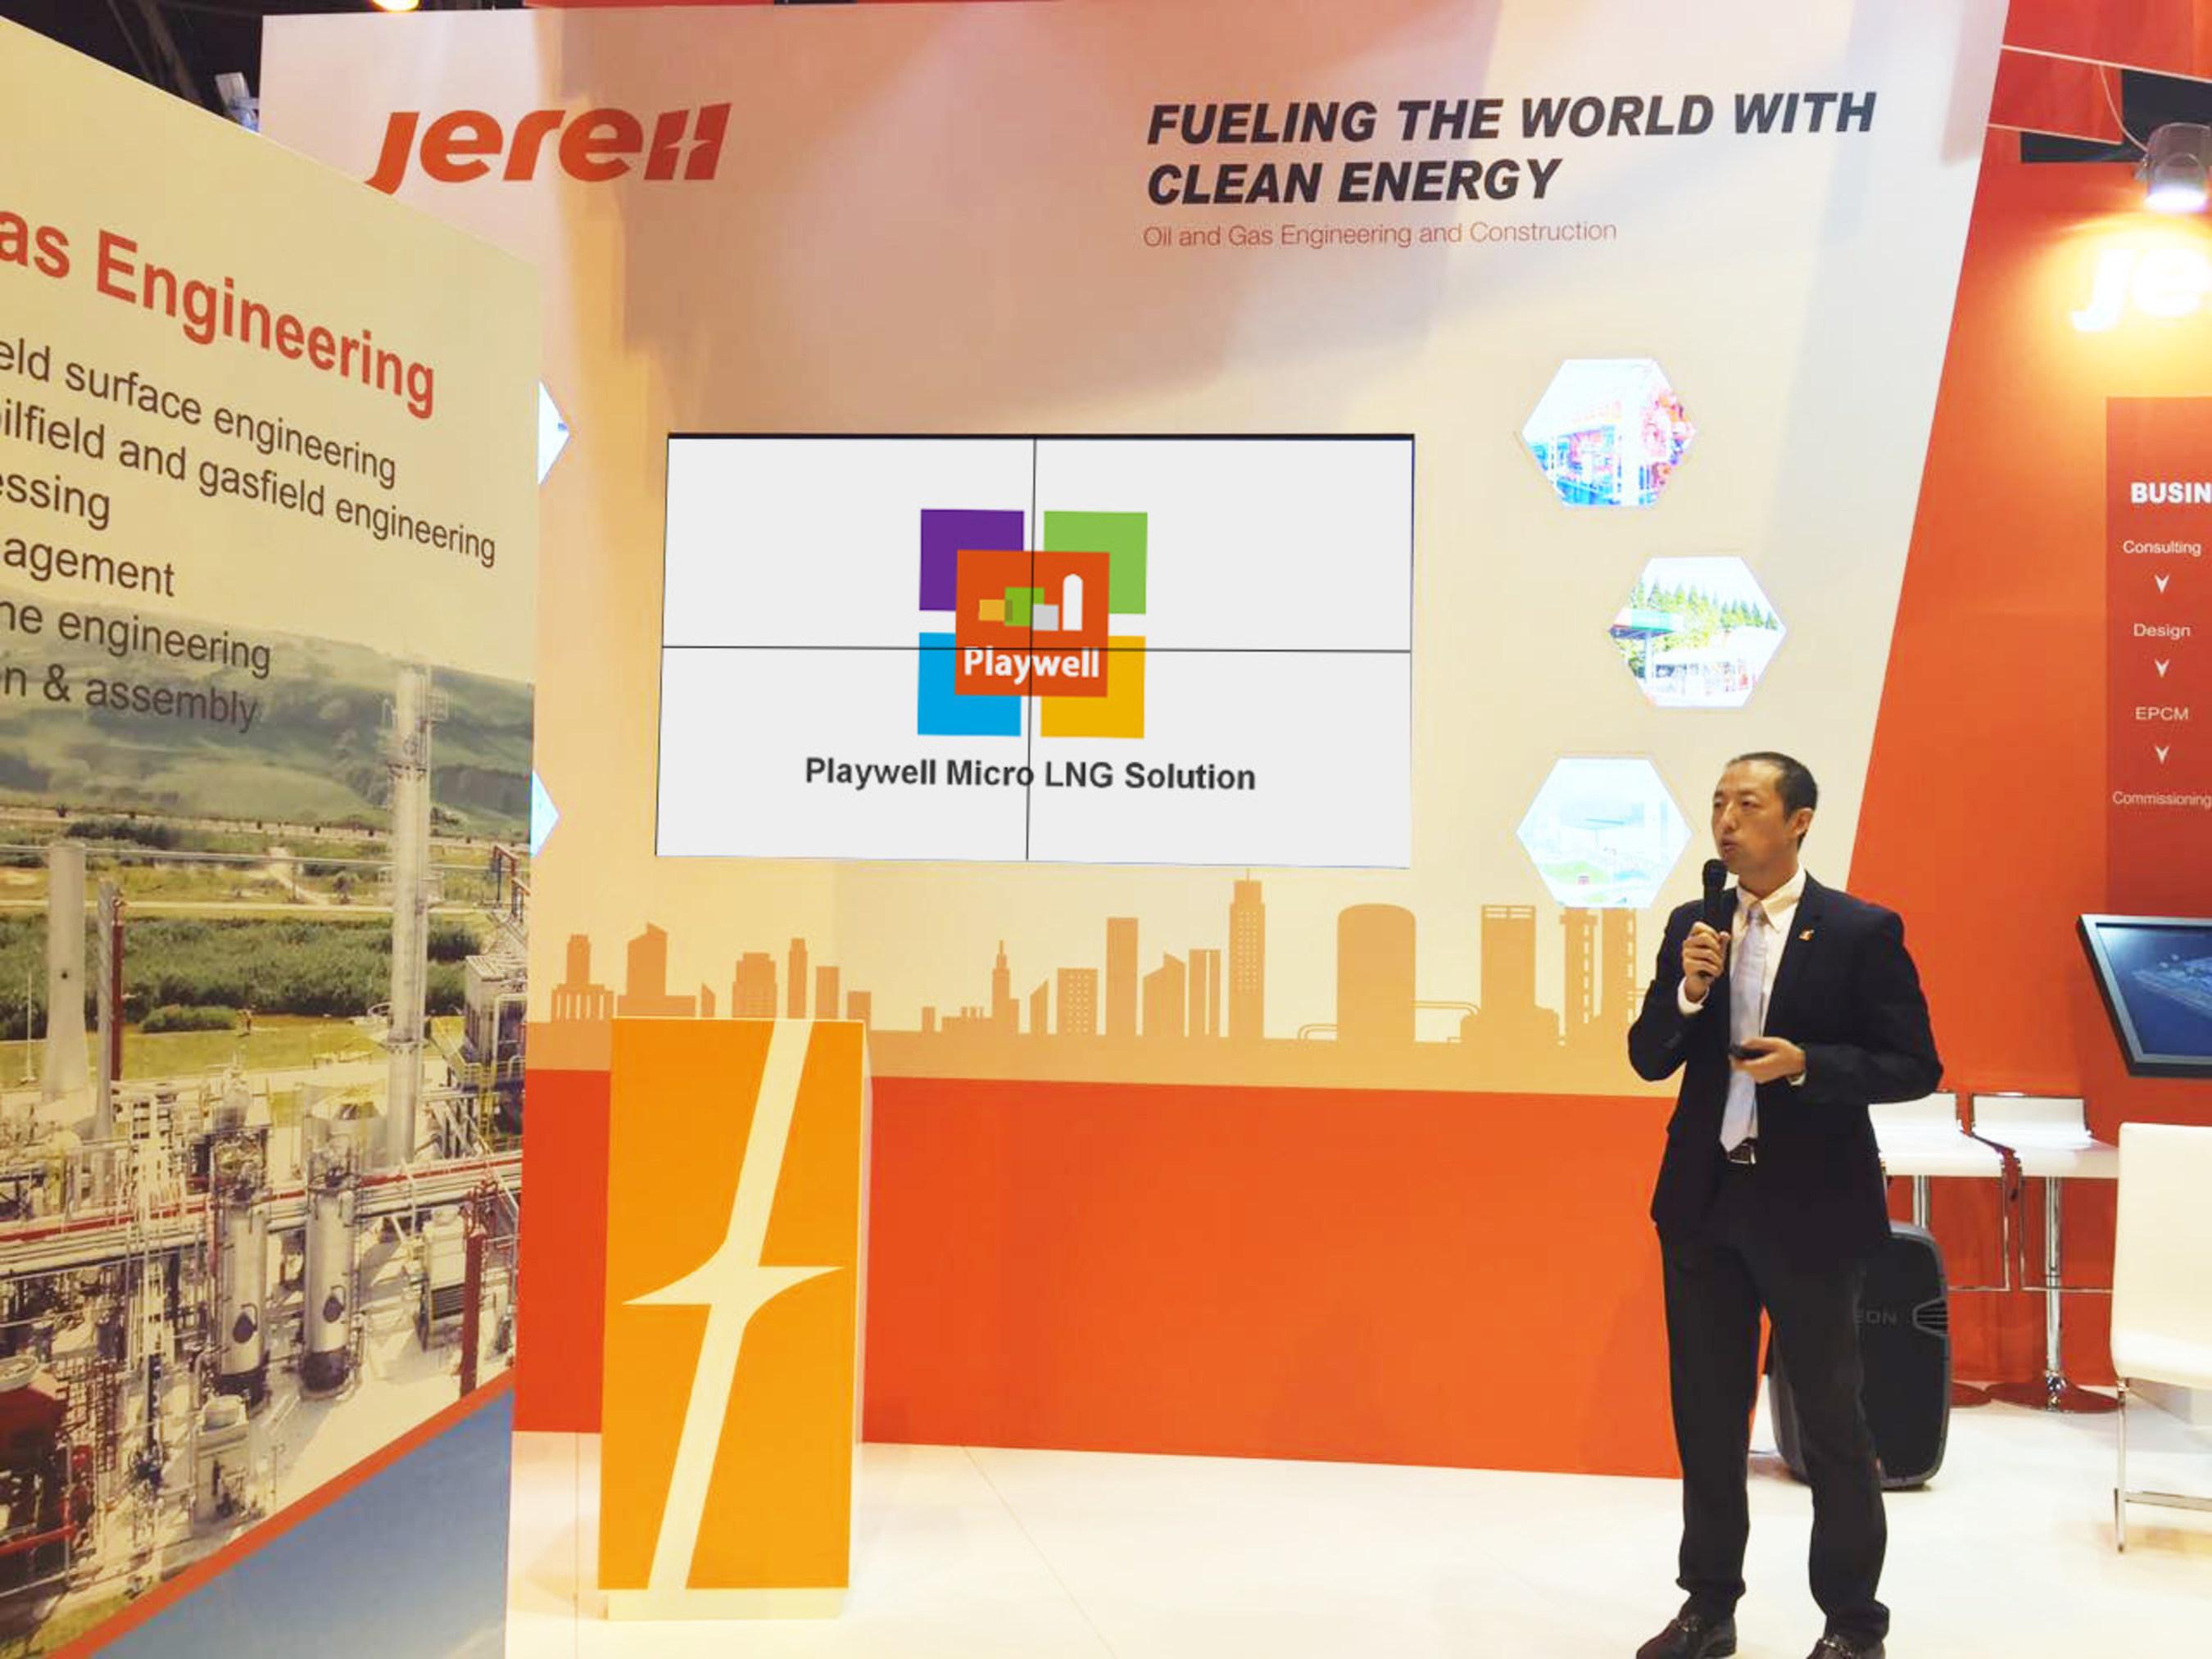 Jereh präsentiert Playwell-Micro-LNG-Lösung auf WGC